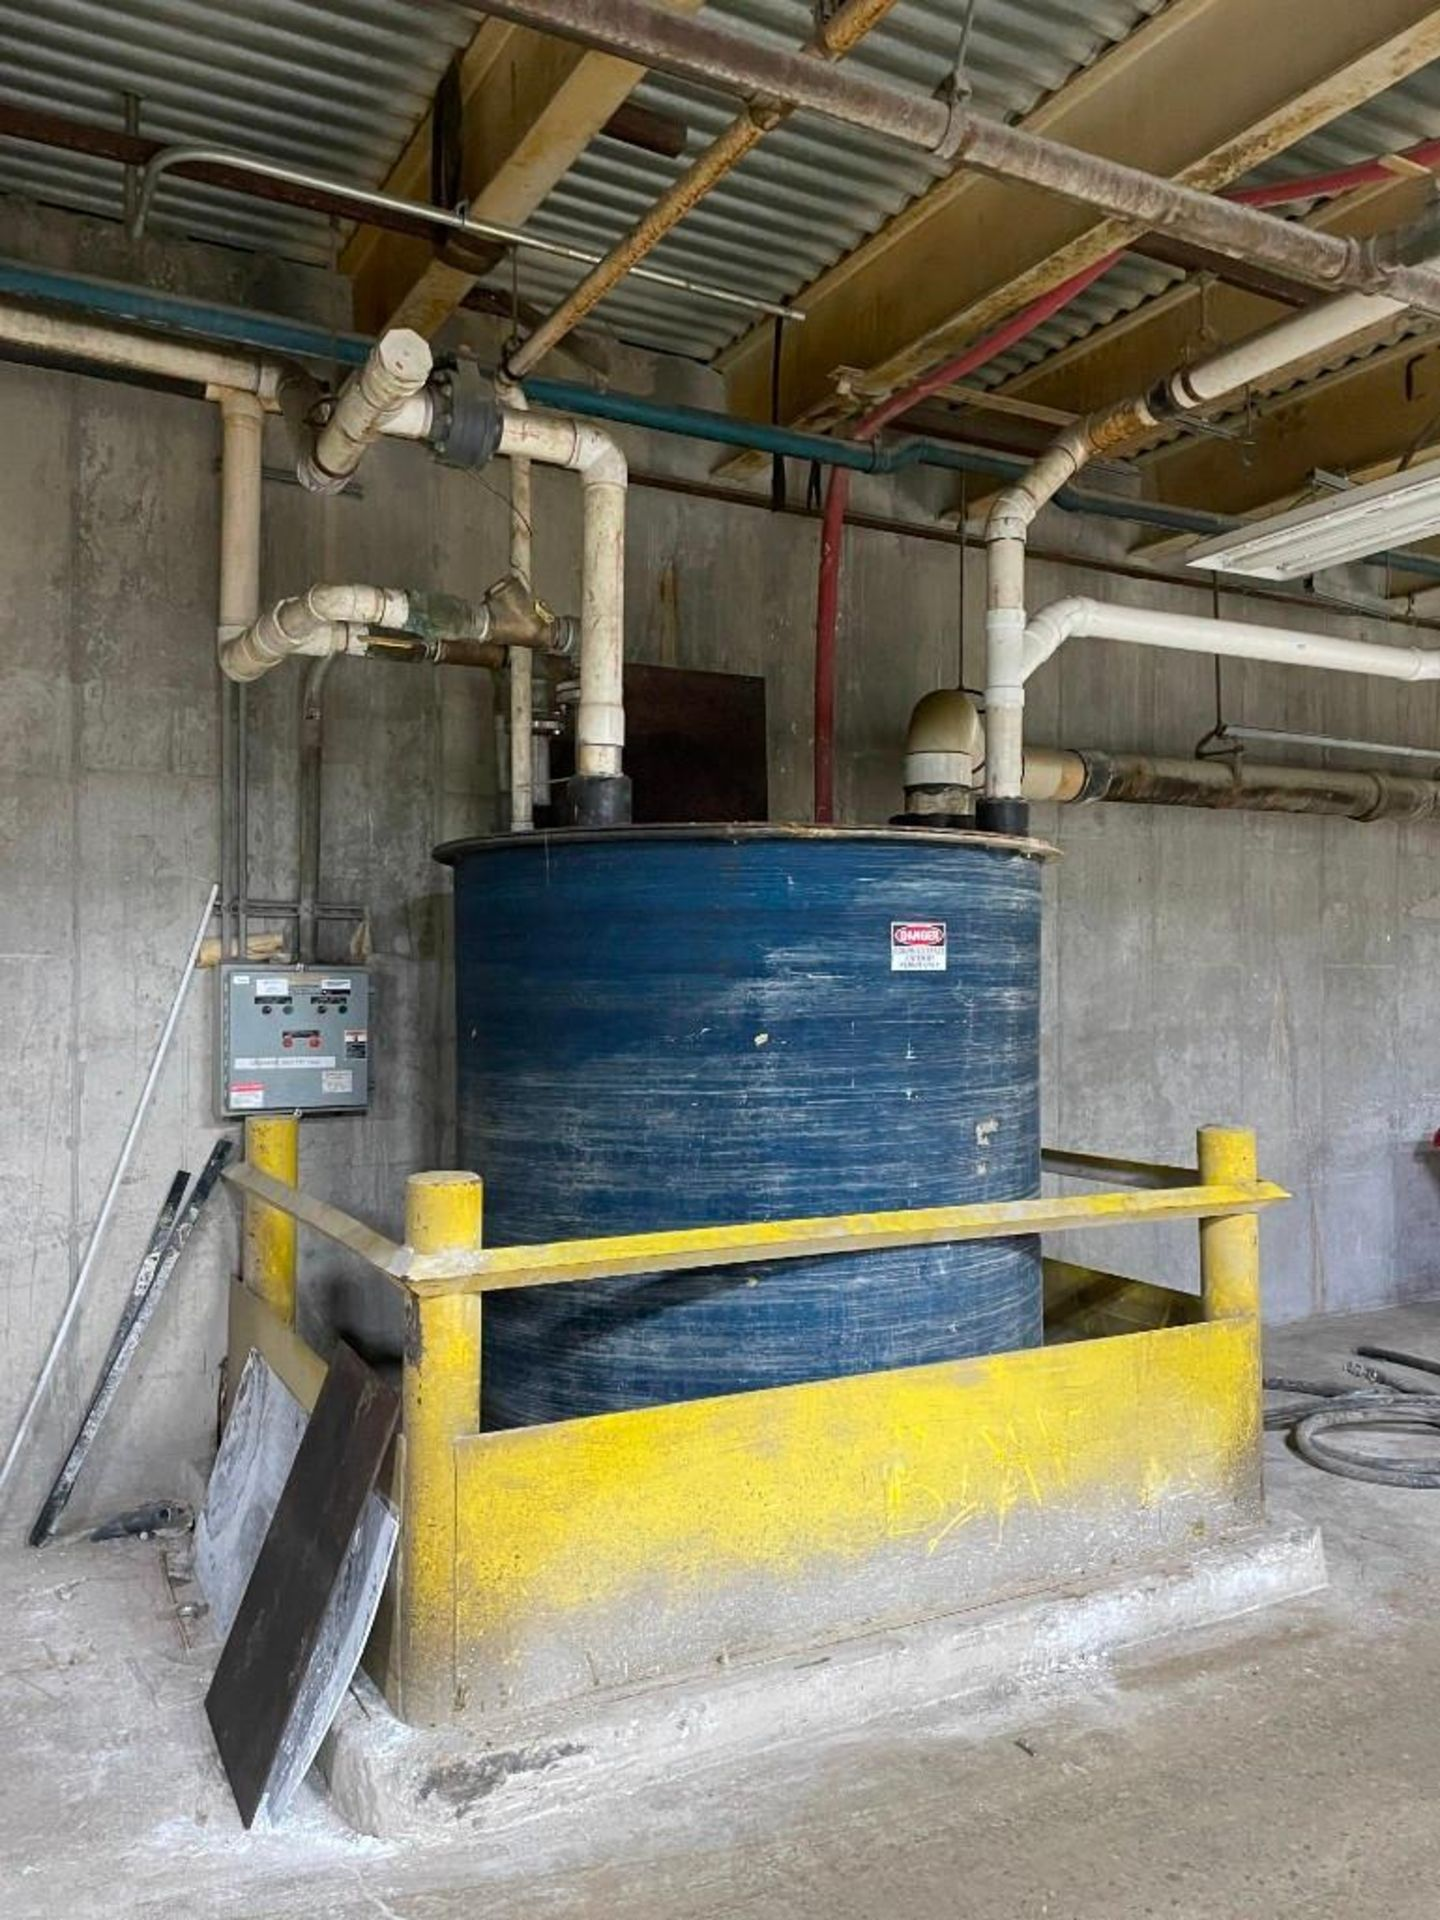 Bell and Gossett Water Tank 1300 Gallons